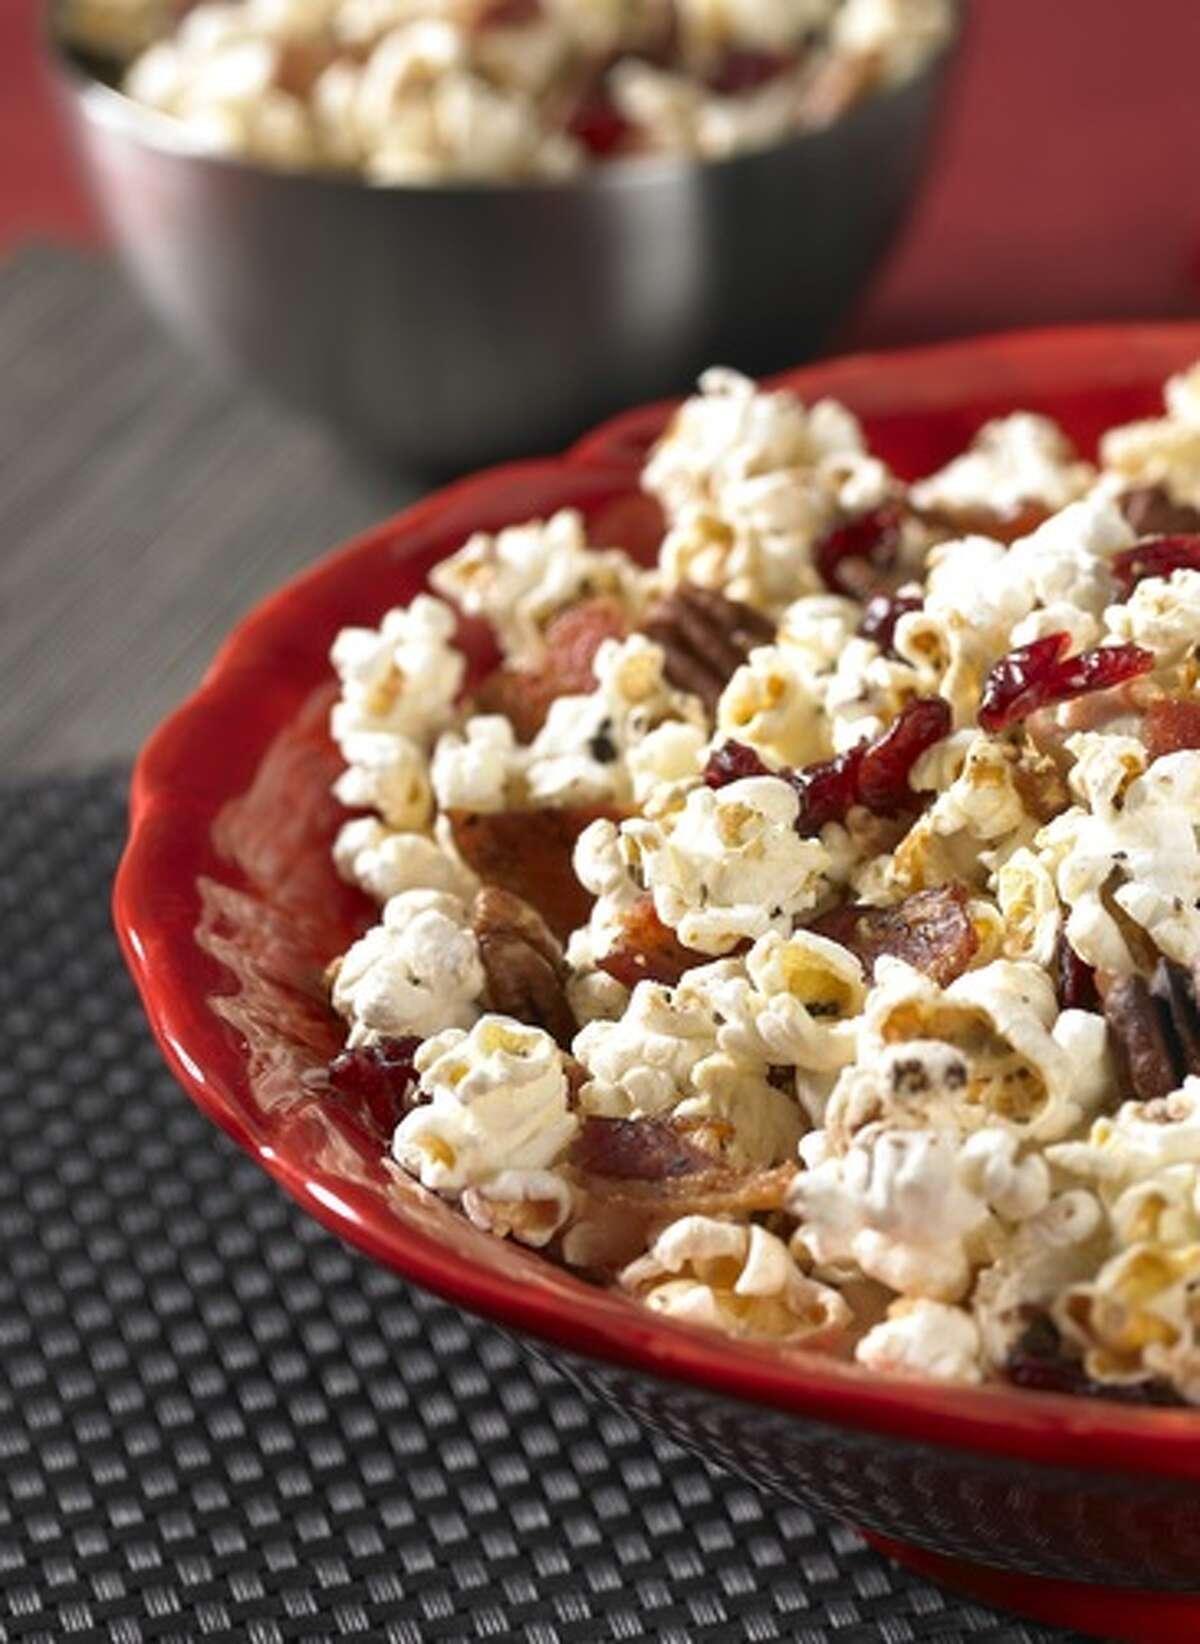 Maple Bacon Popcorn is a crunch Halloween treat.